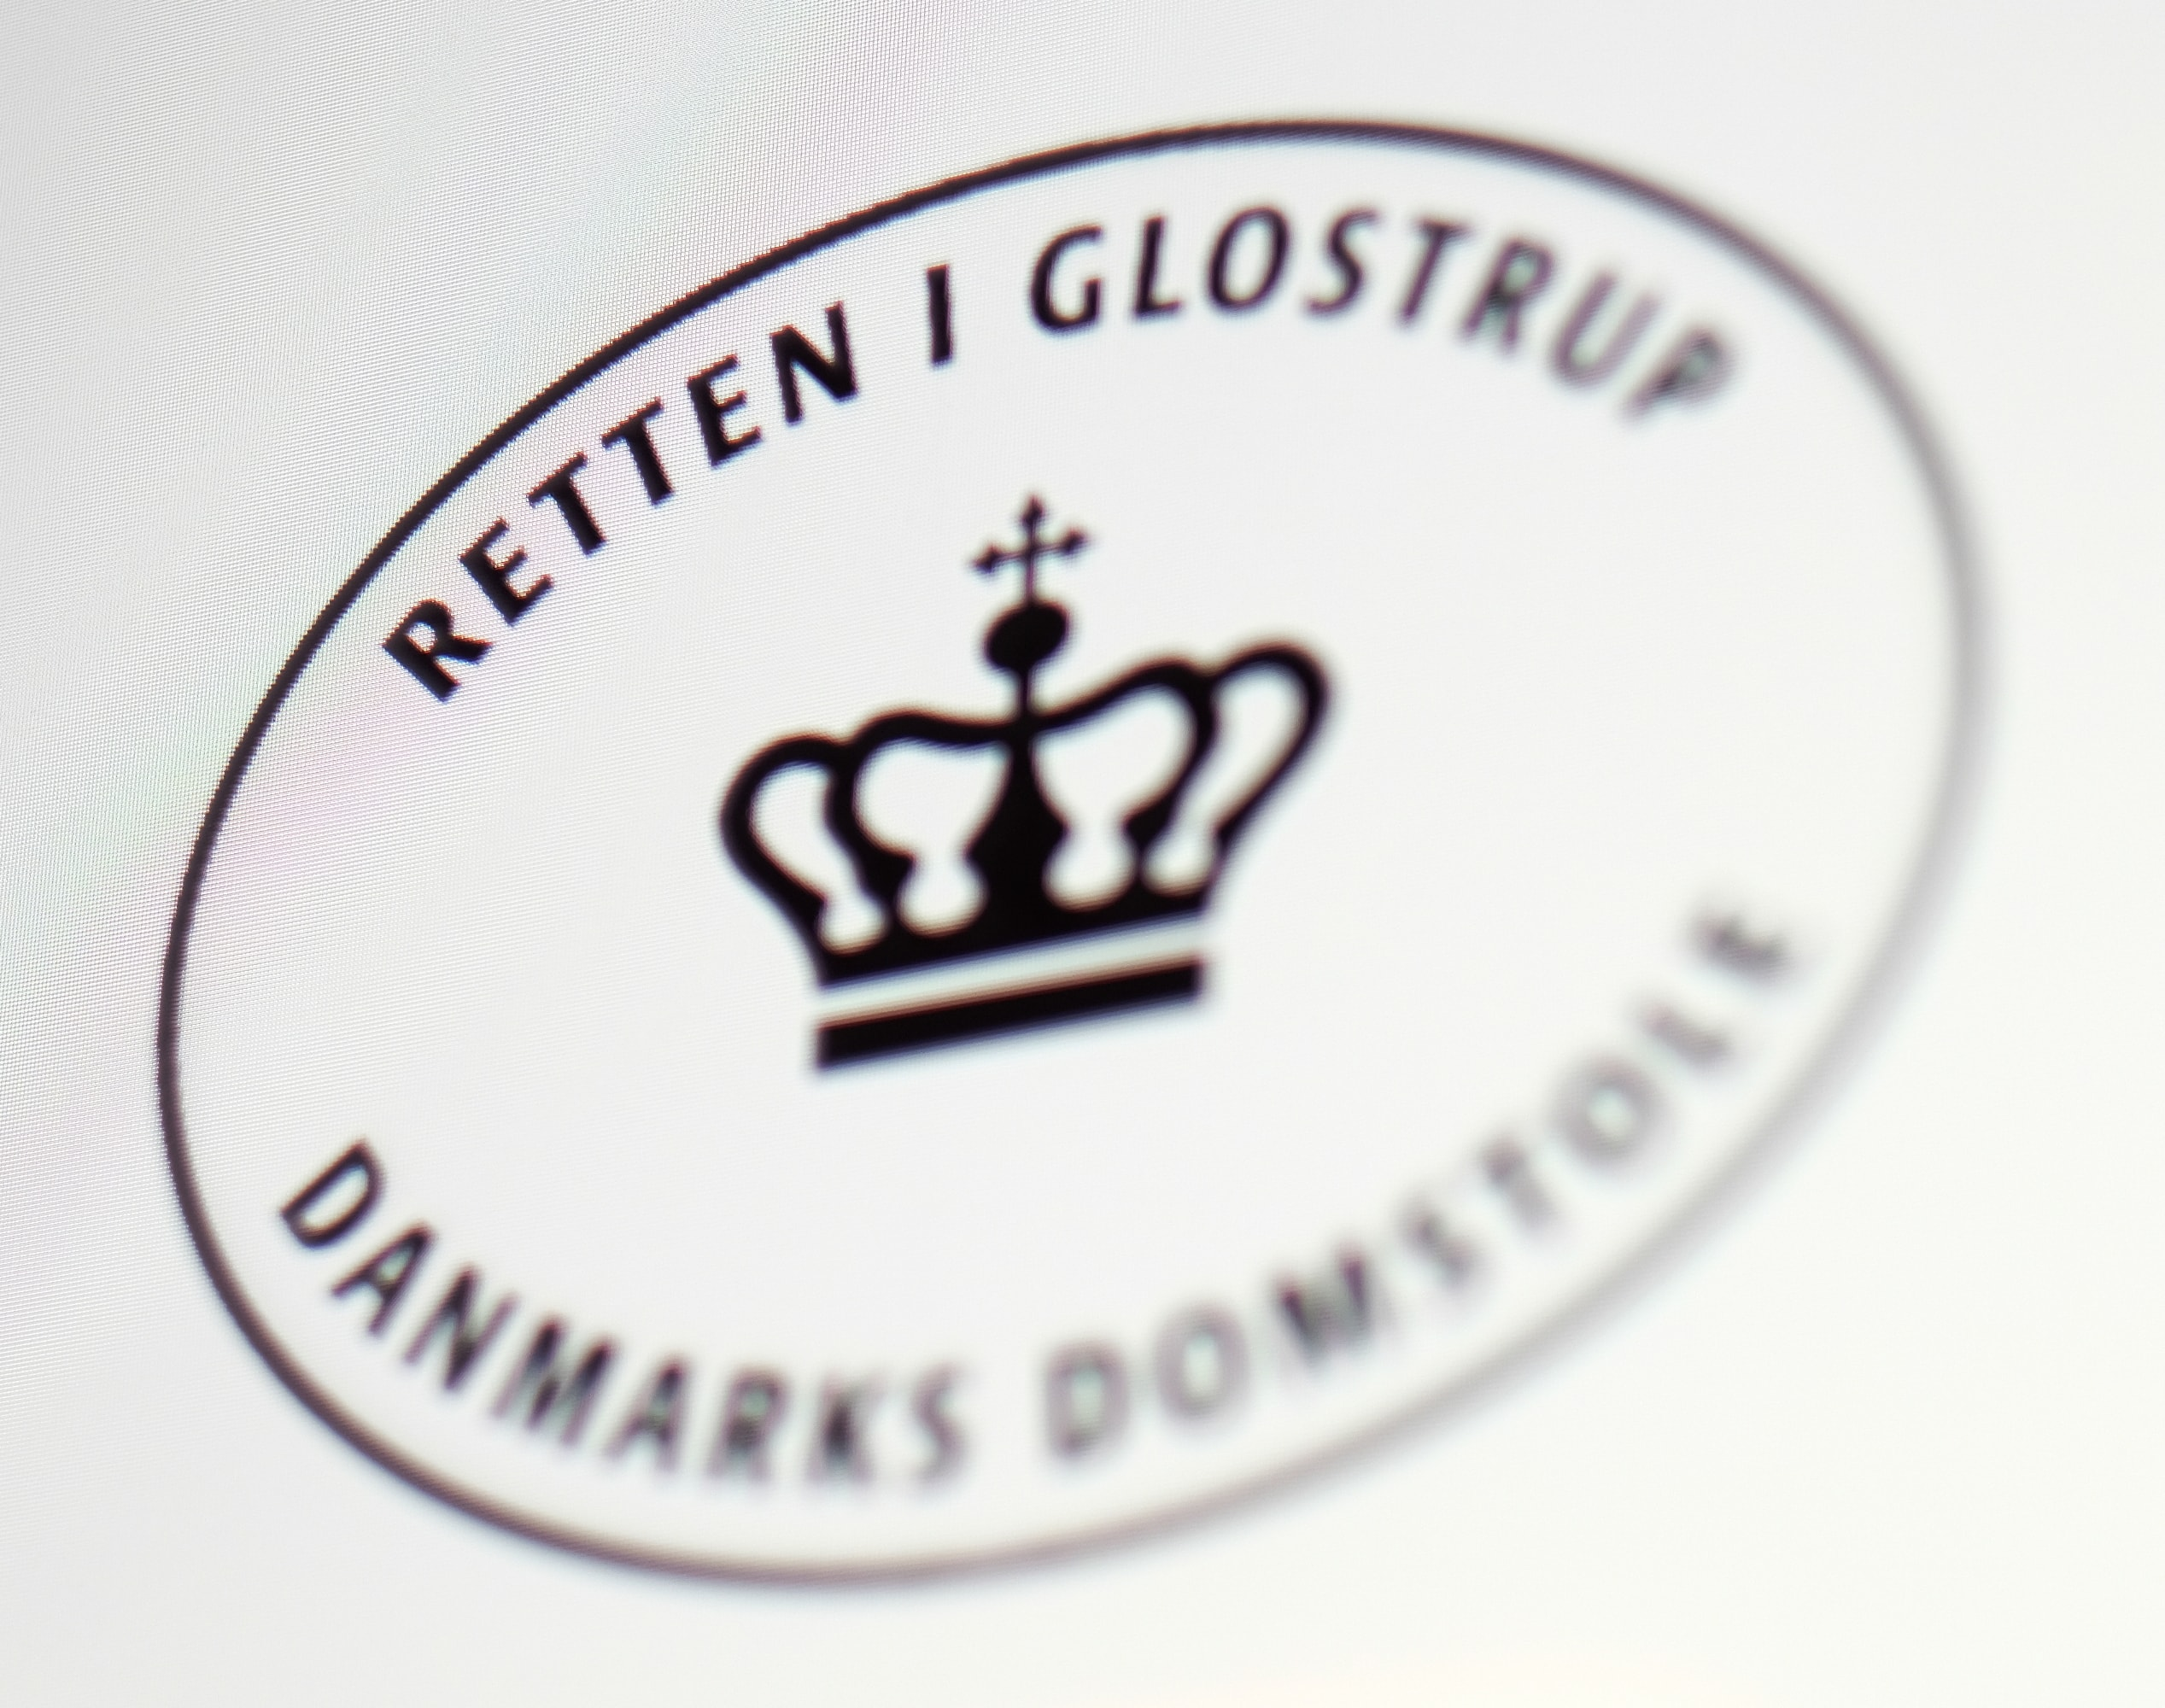 Retten i Glostrup, Københavns Vestegns Politi